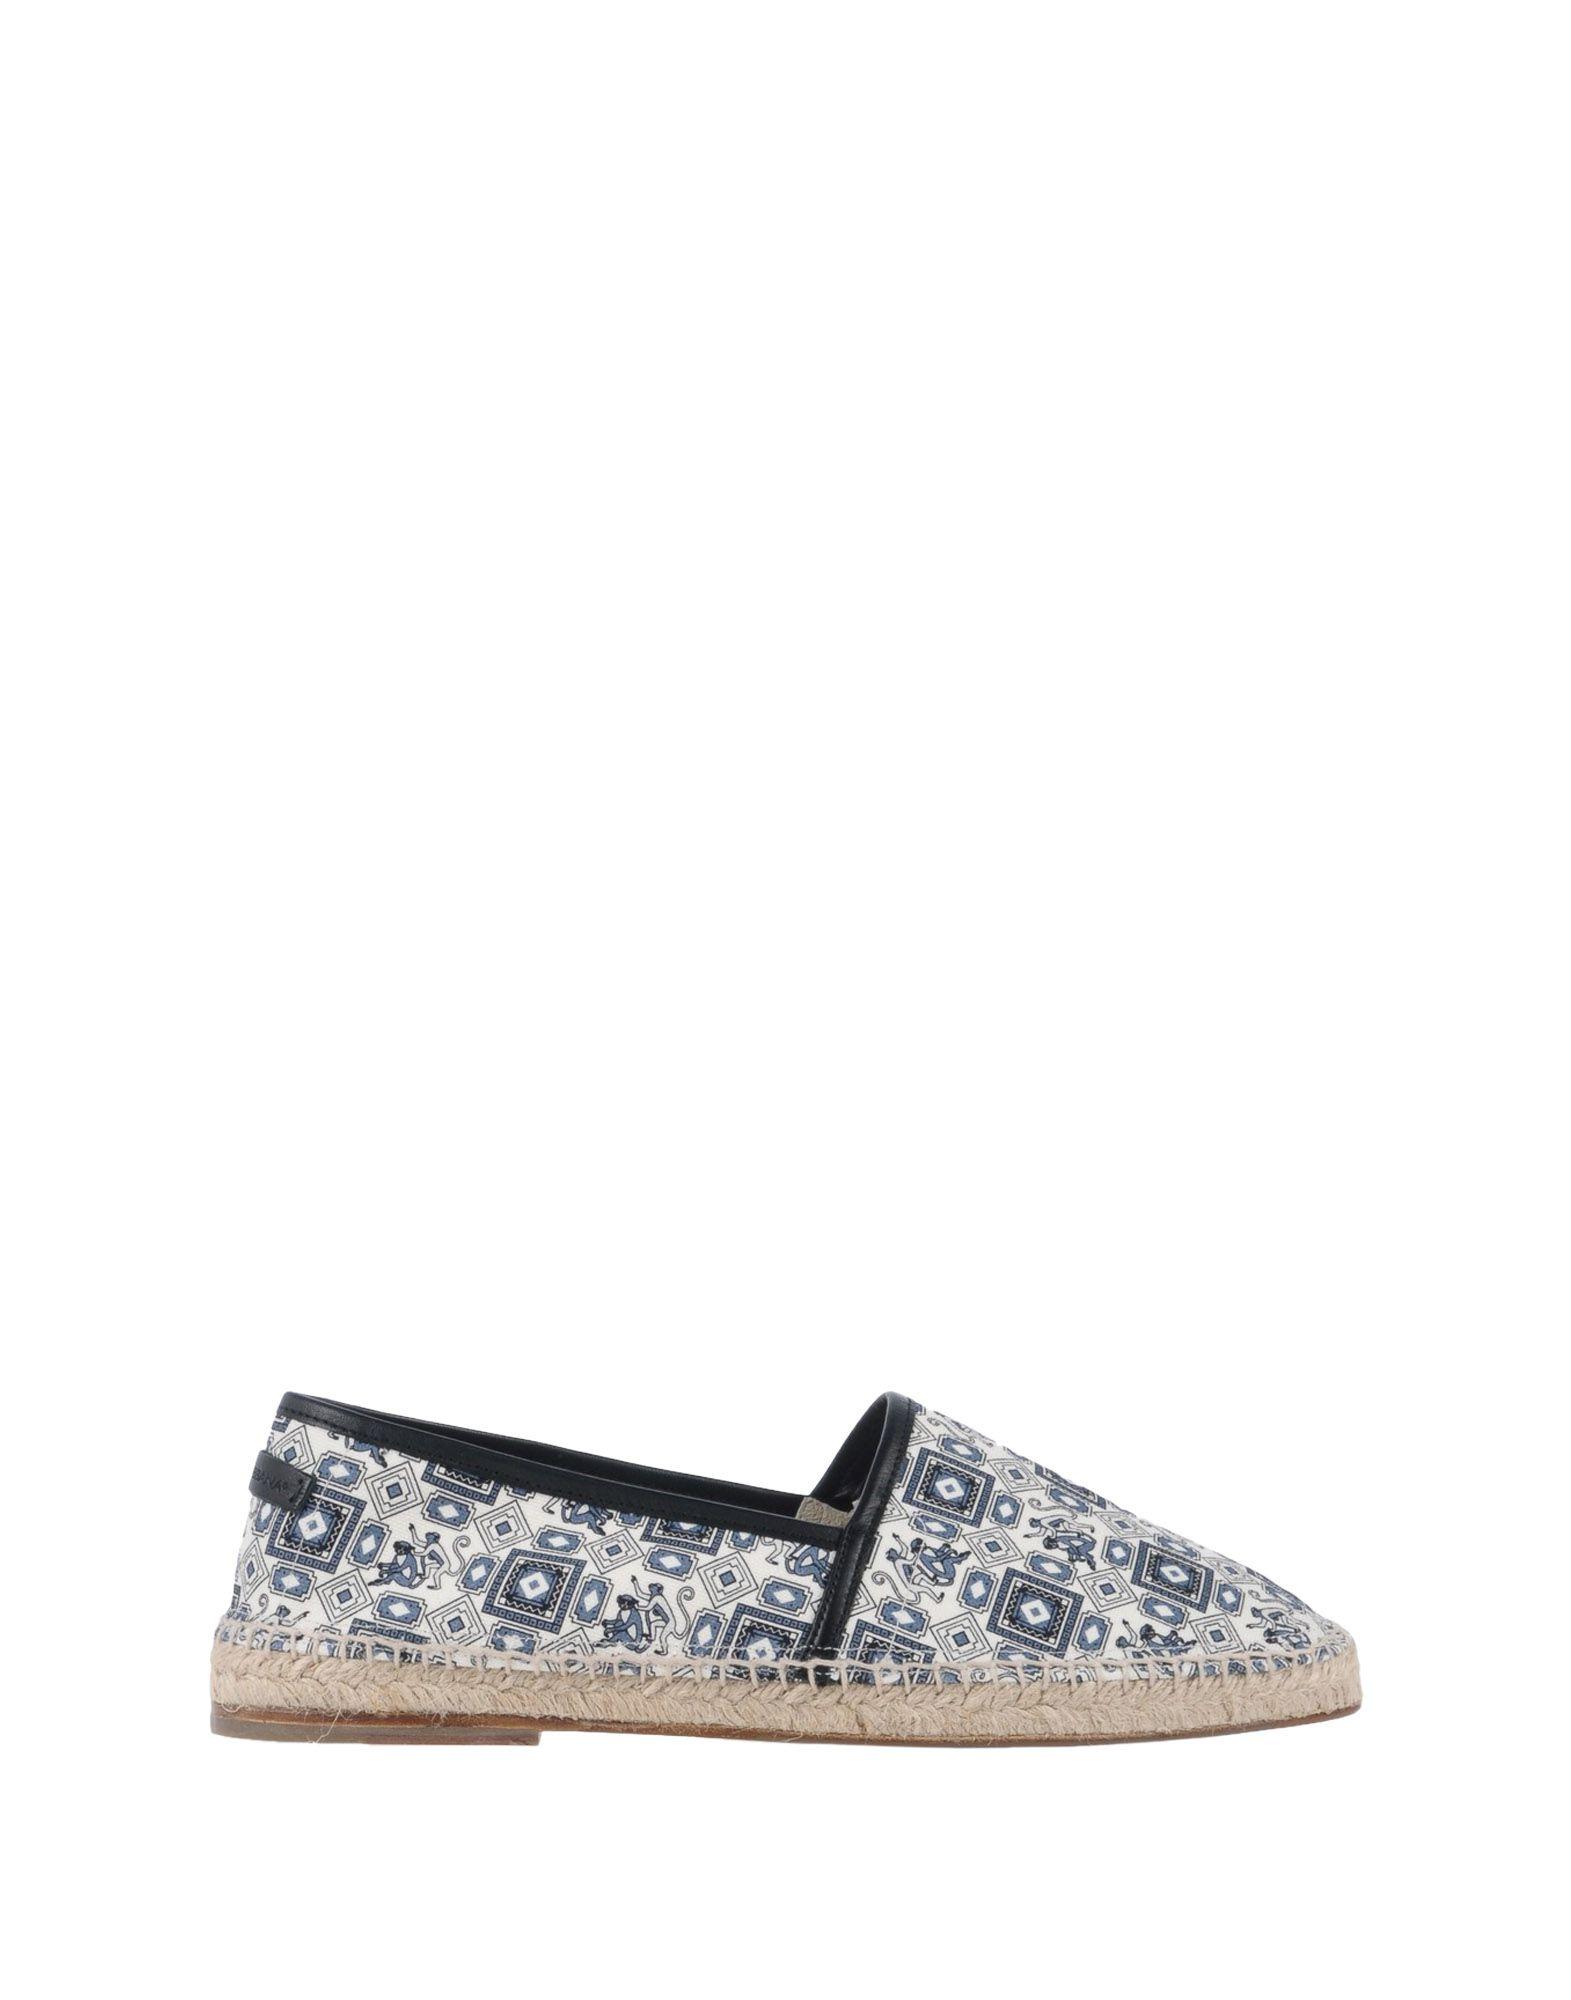 Dolce & Gabbana Espadrilles Herren beliebte  11430655EO Gute Qualität beliebte Herren Schuhe 0e7e15